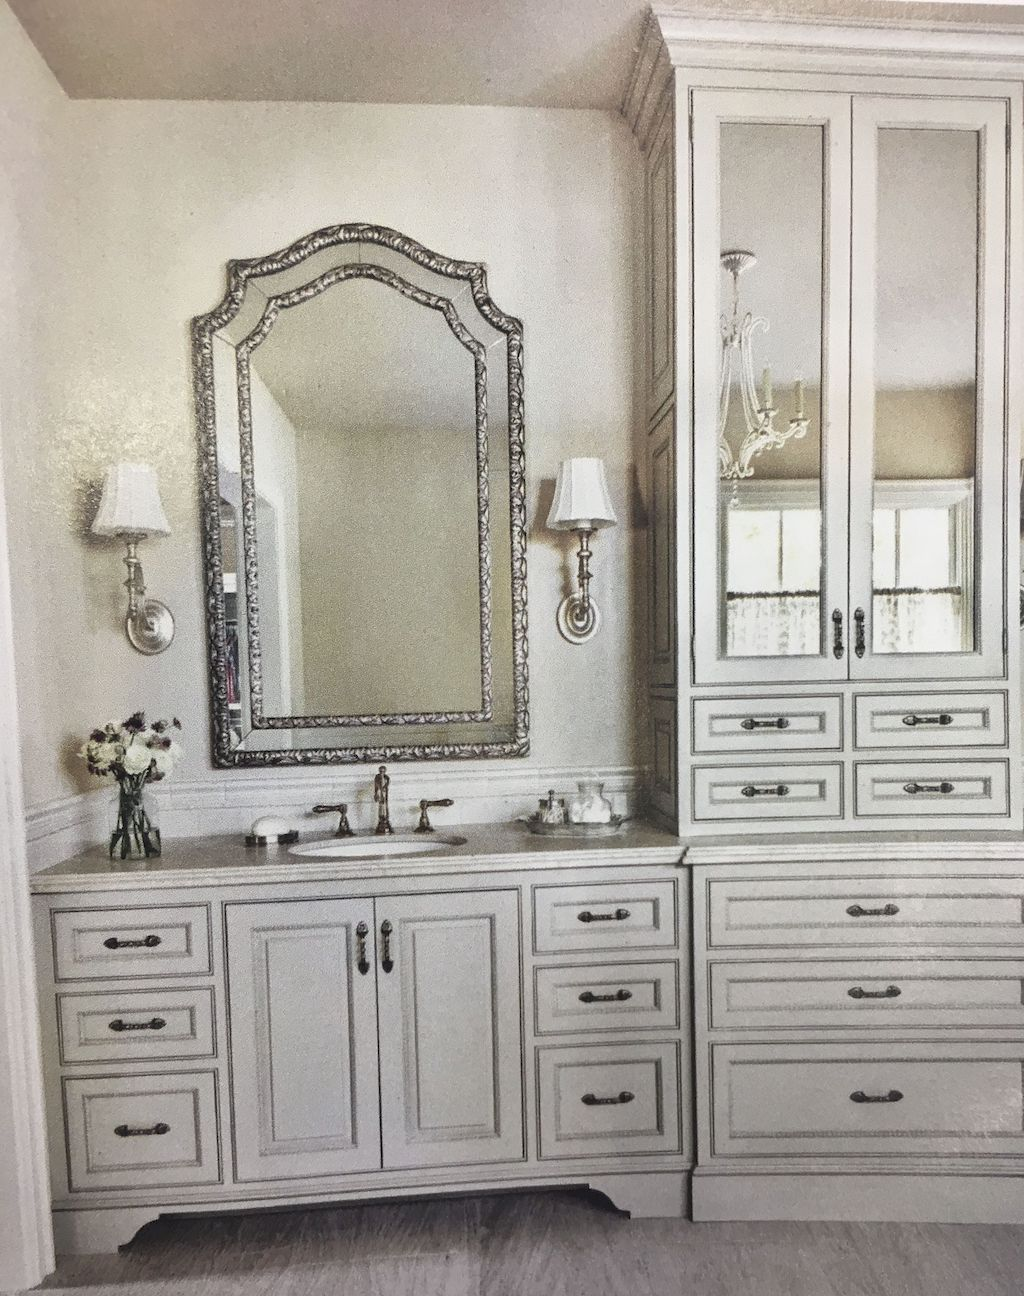 63 Inspiring French Country Bathroom Design Ideas Homixover Com French Country Bathroom Small Country Bathrooms Country Style Bathrooms